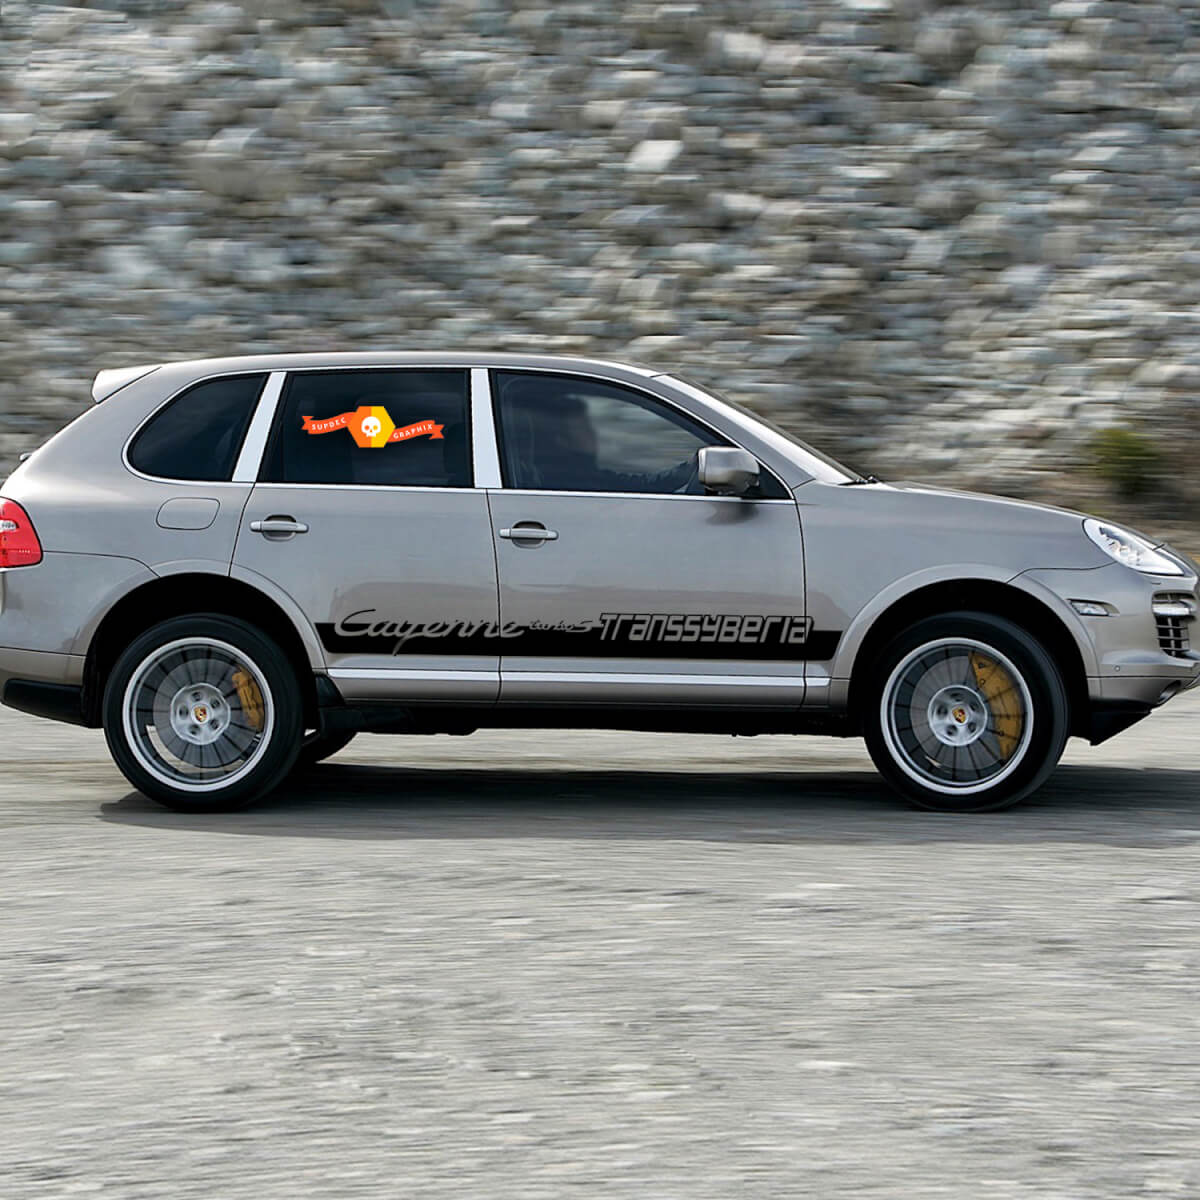 New Porsche Cayenne Transsyberian Side Stripes Kit Decal Sticker #1